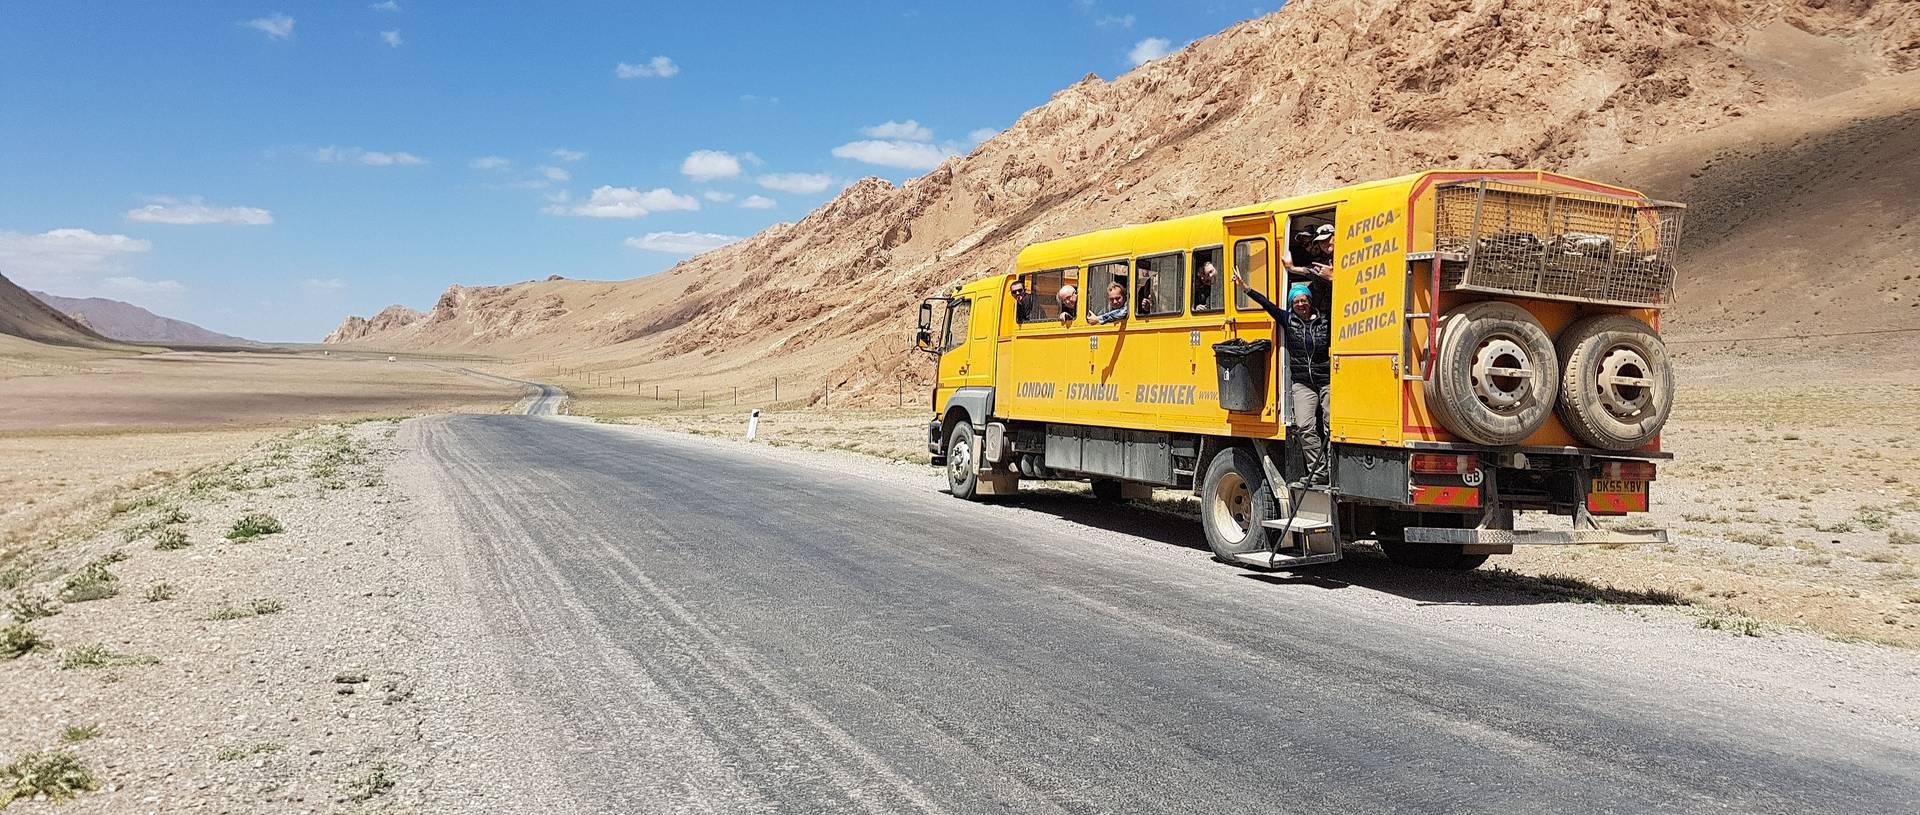 Photo Stop Tajikistan